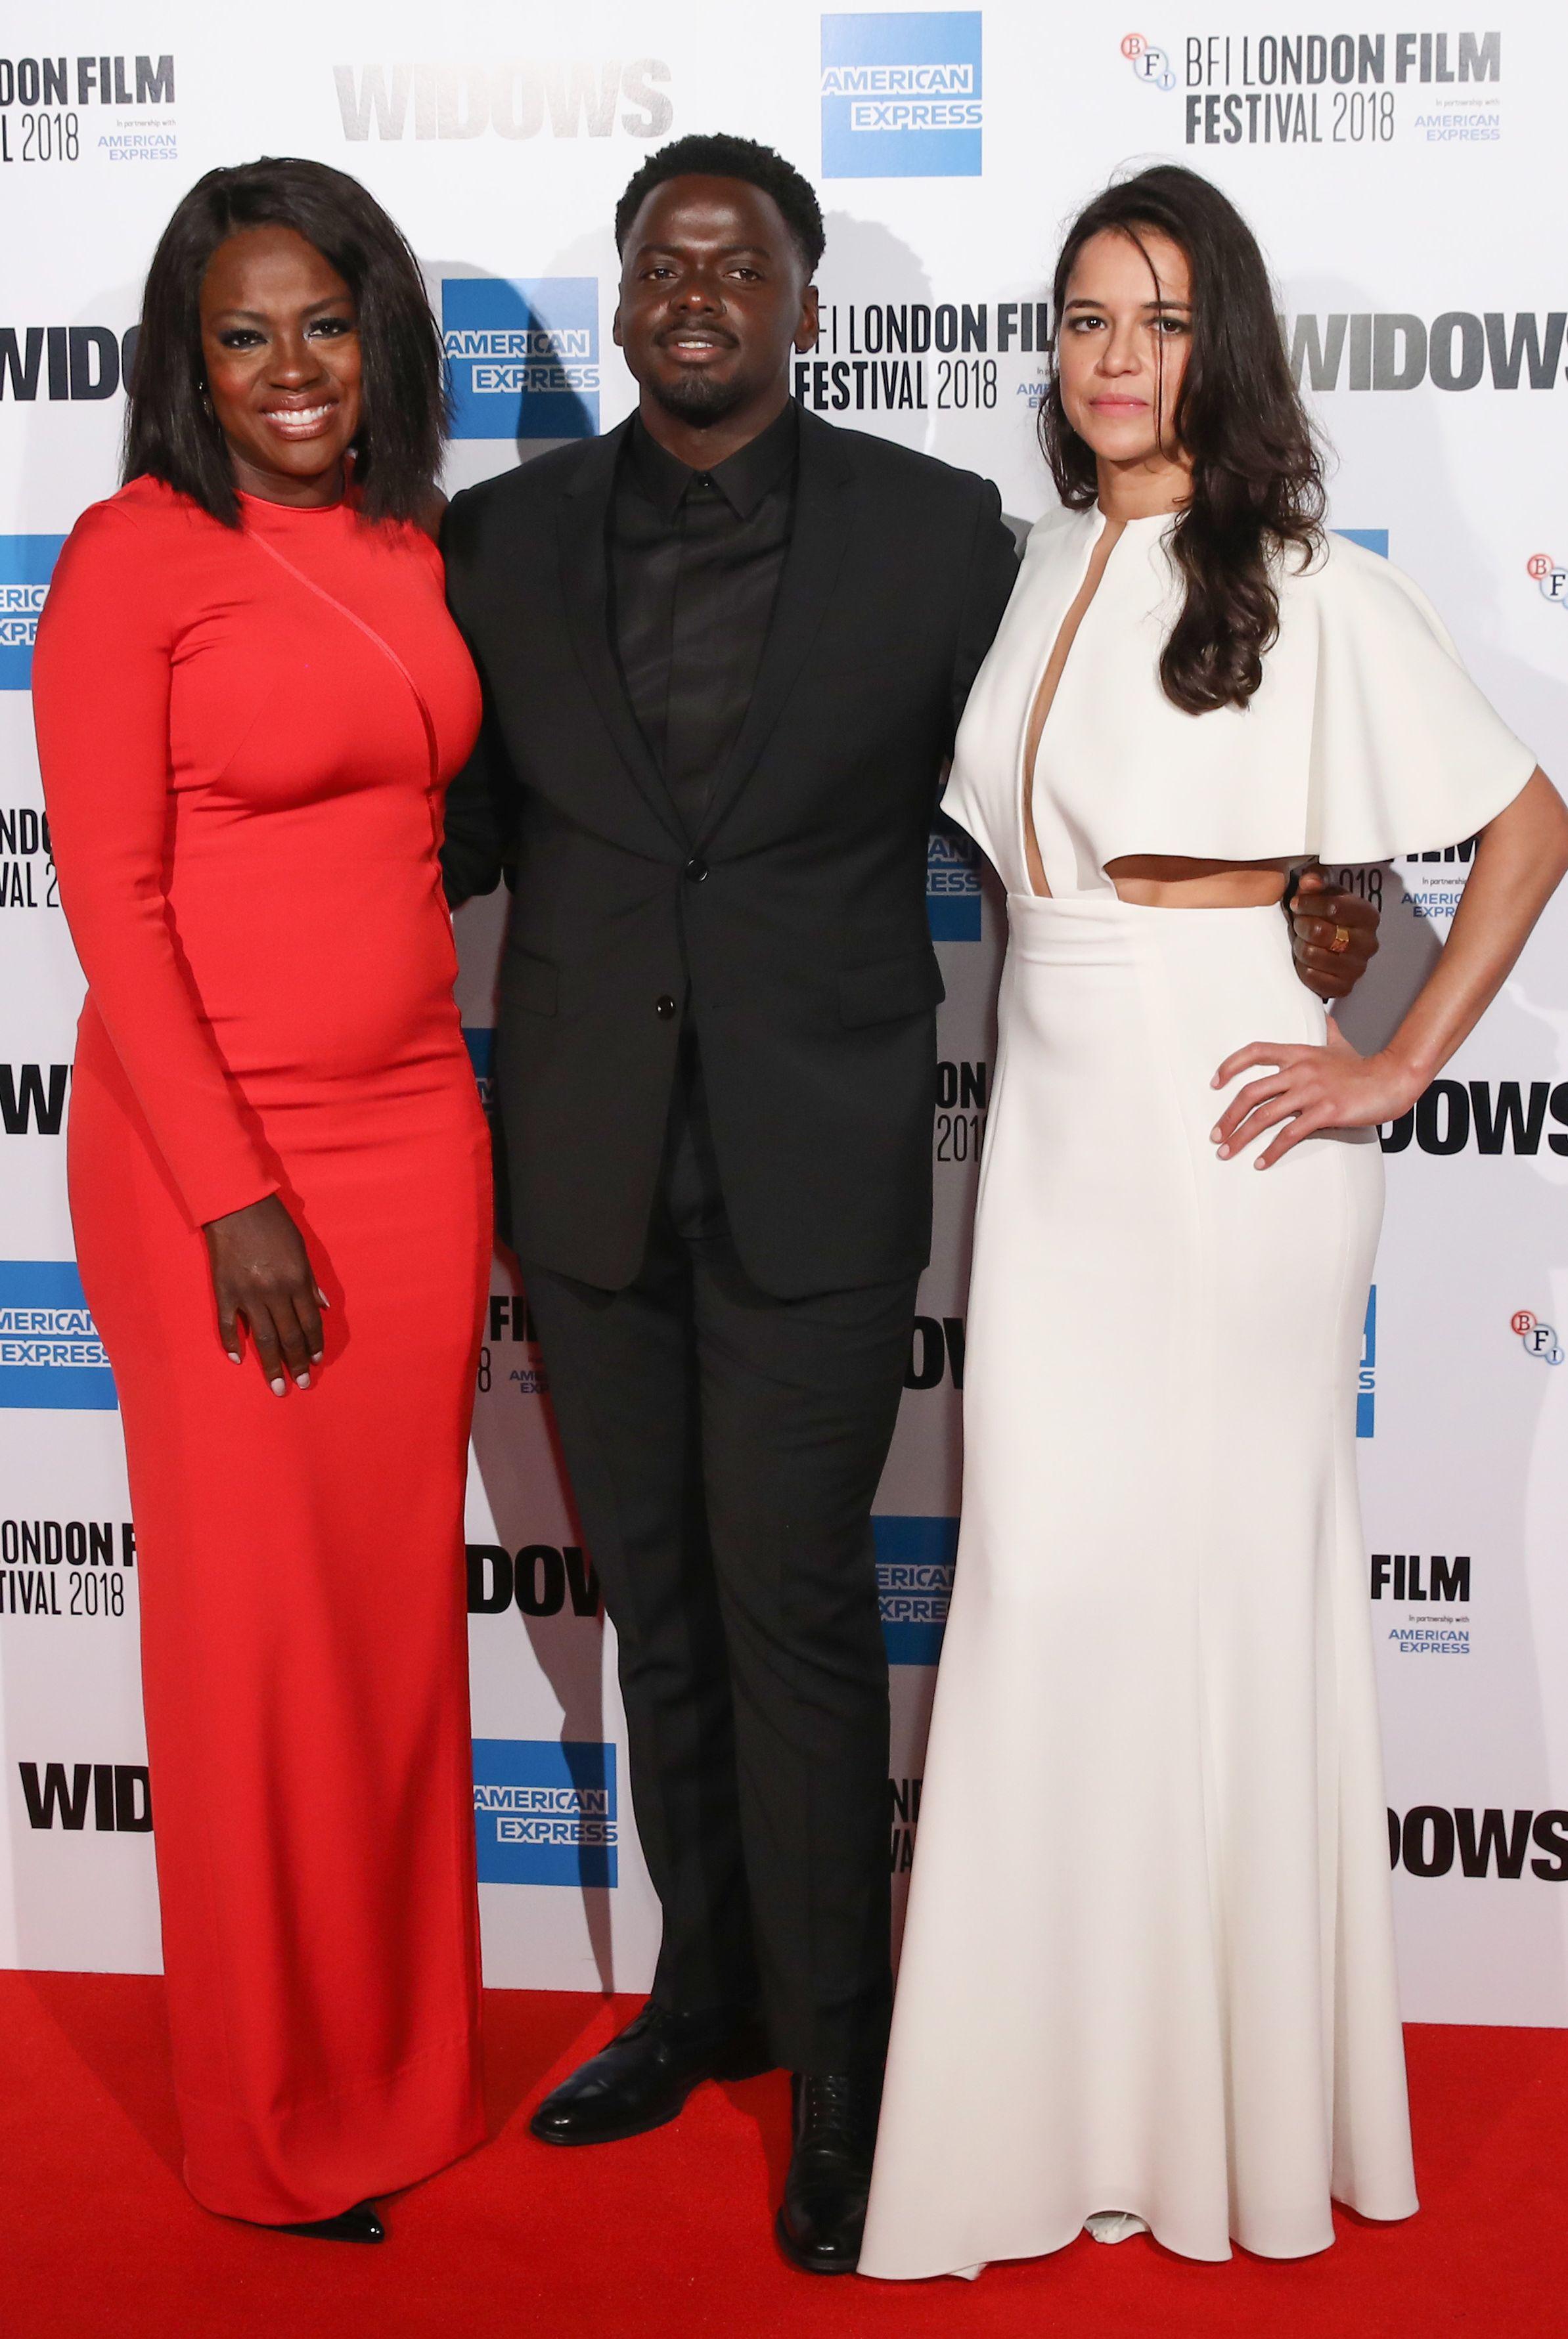 'Widows' European Premiere & Opening Night Gala -  62nd BFI London Film Festival